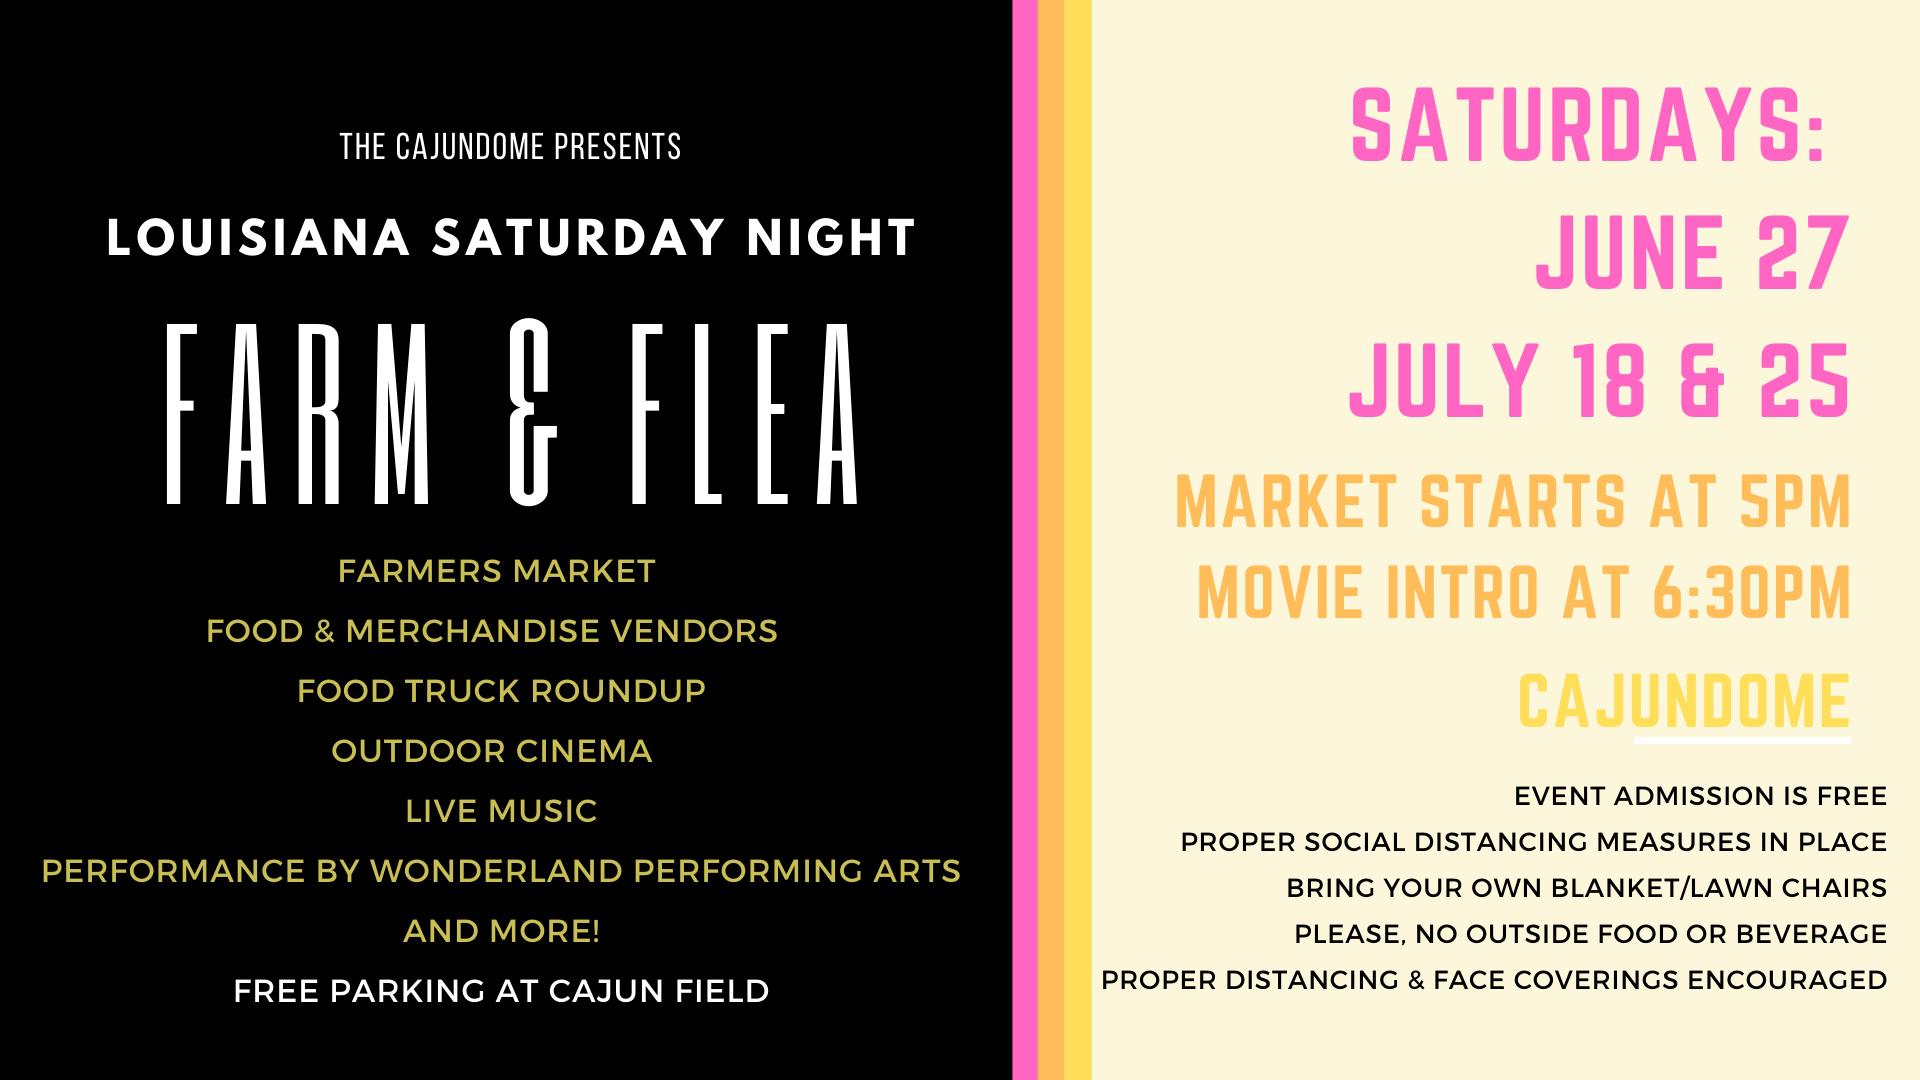 Cajundome Presents 'Louisiana Saturday Night' Summer Events